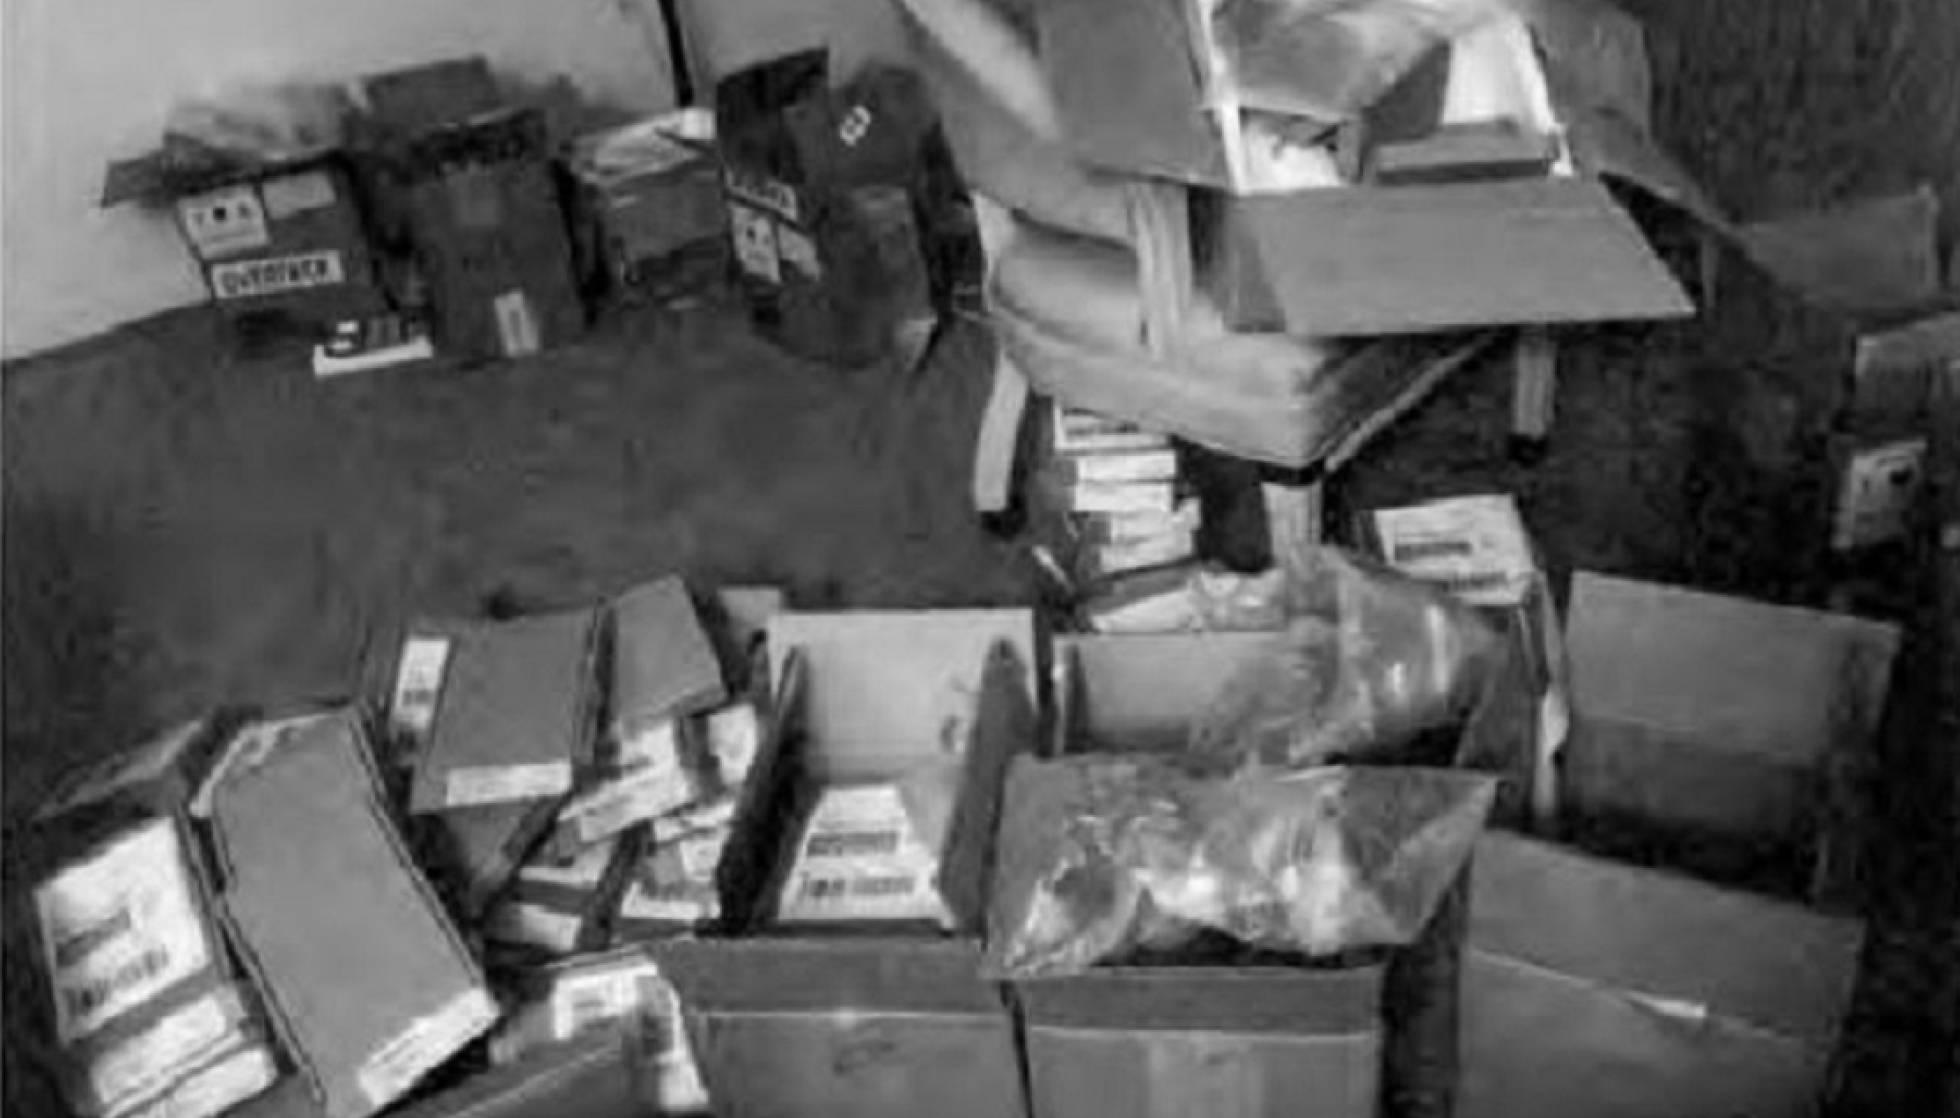 1 cajas de iphones almacenadas